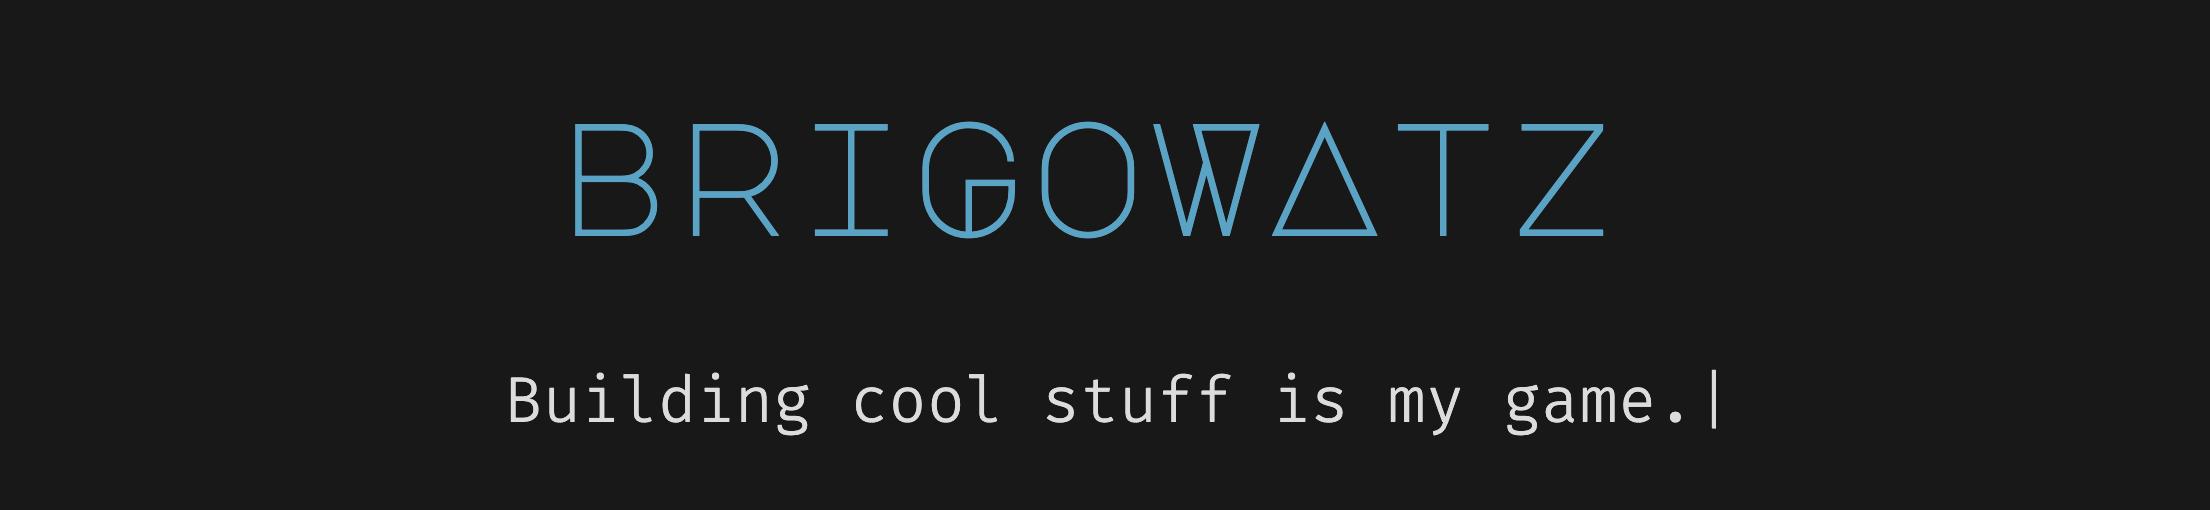 Brigowatz Building cool stuff is my game!